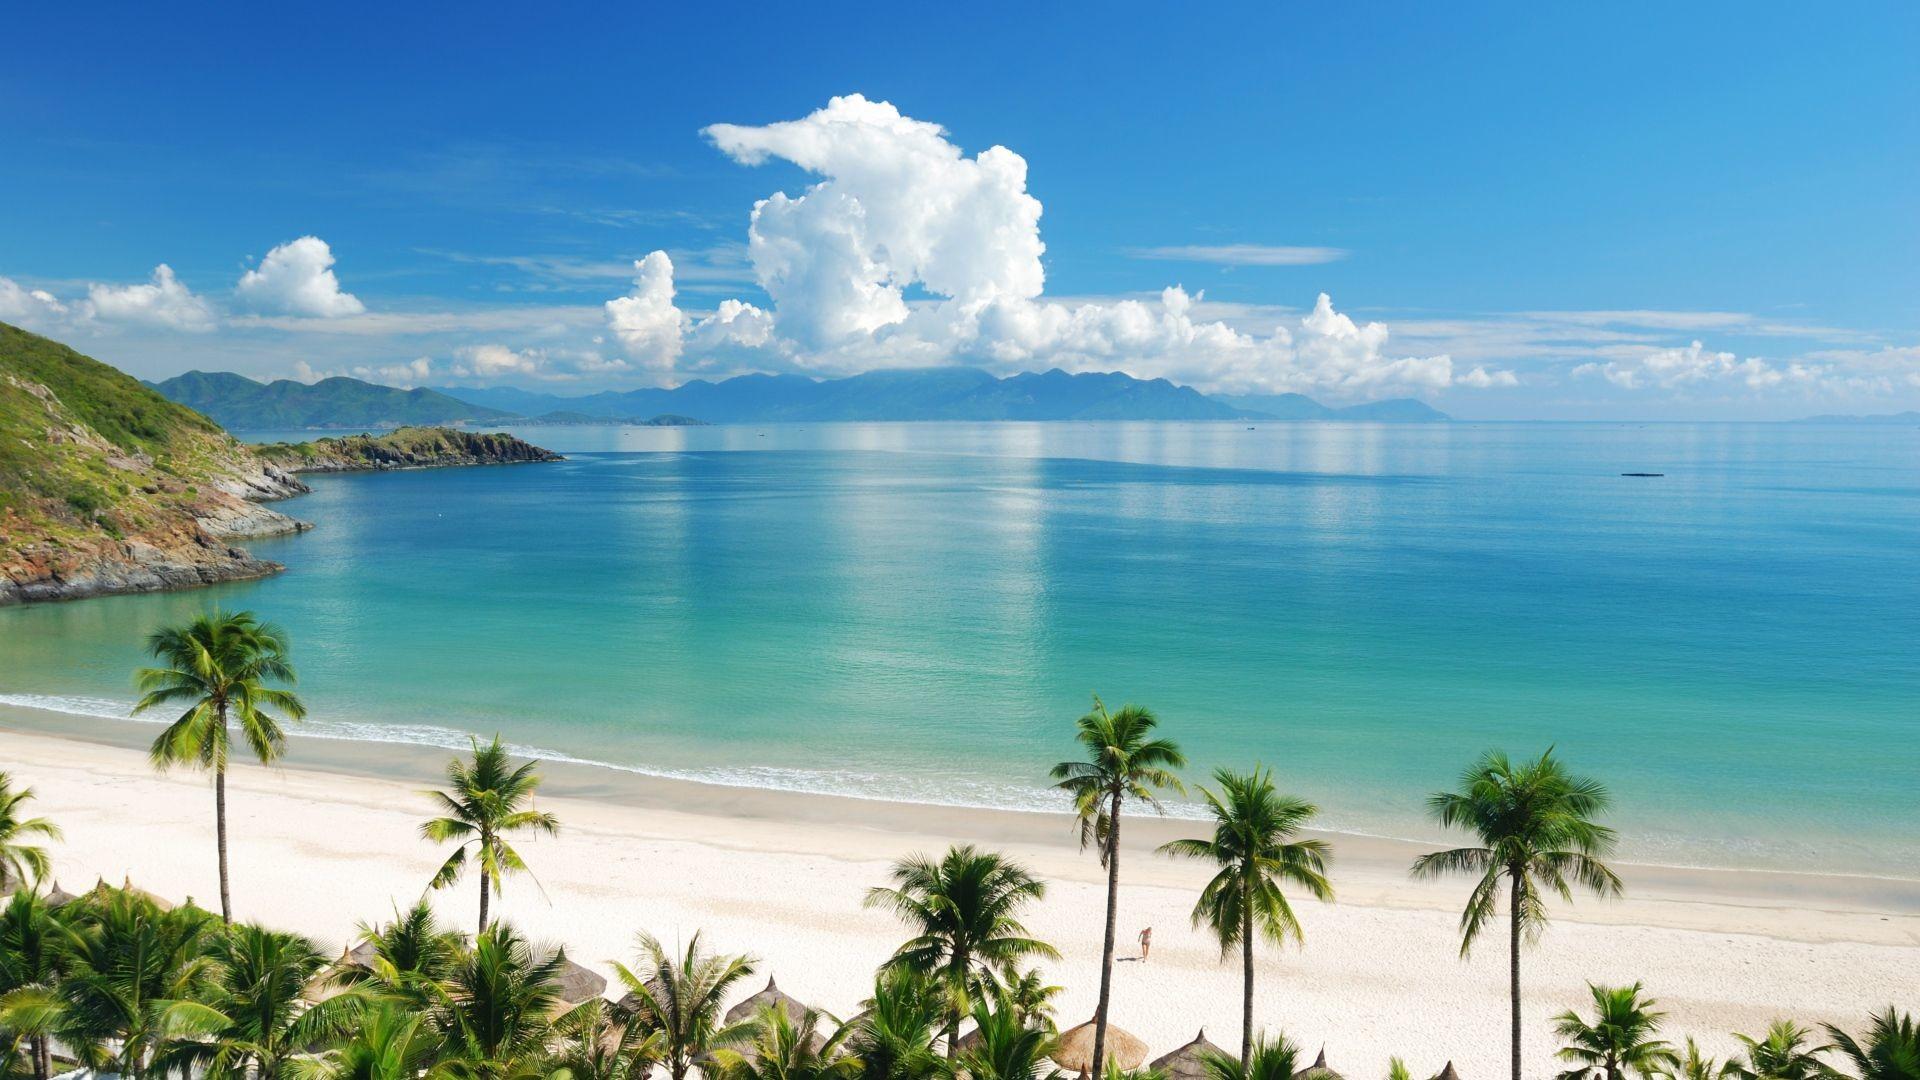 Full HD 1080p Beach Wallpapers HD, Desktop Backgrounds 1920×1080